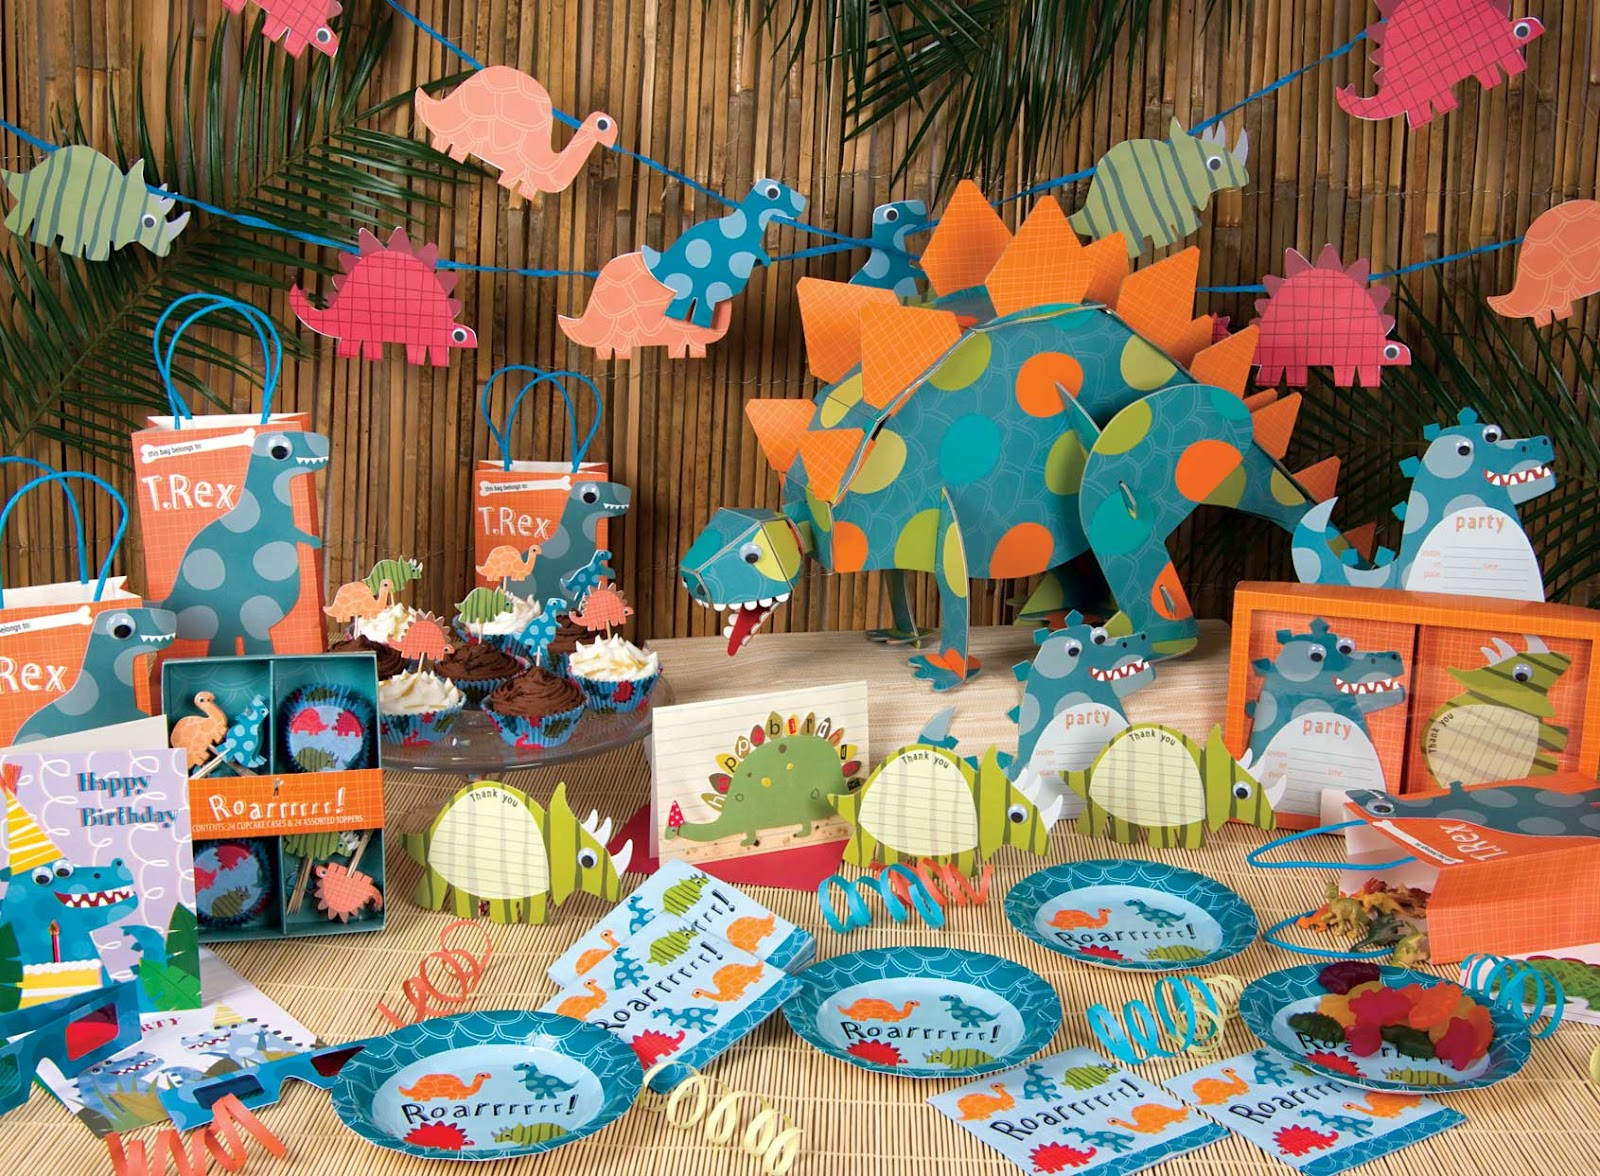 Kalliopelp decoraci n de fiestas infantiles de dinosaurios for Decoracion ninos